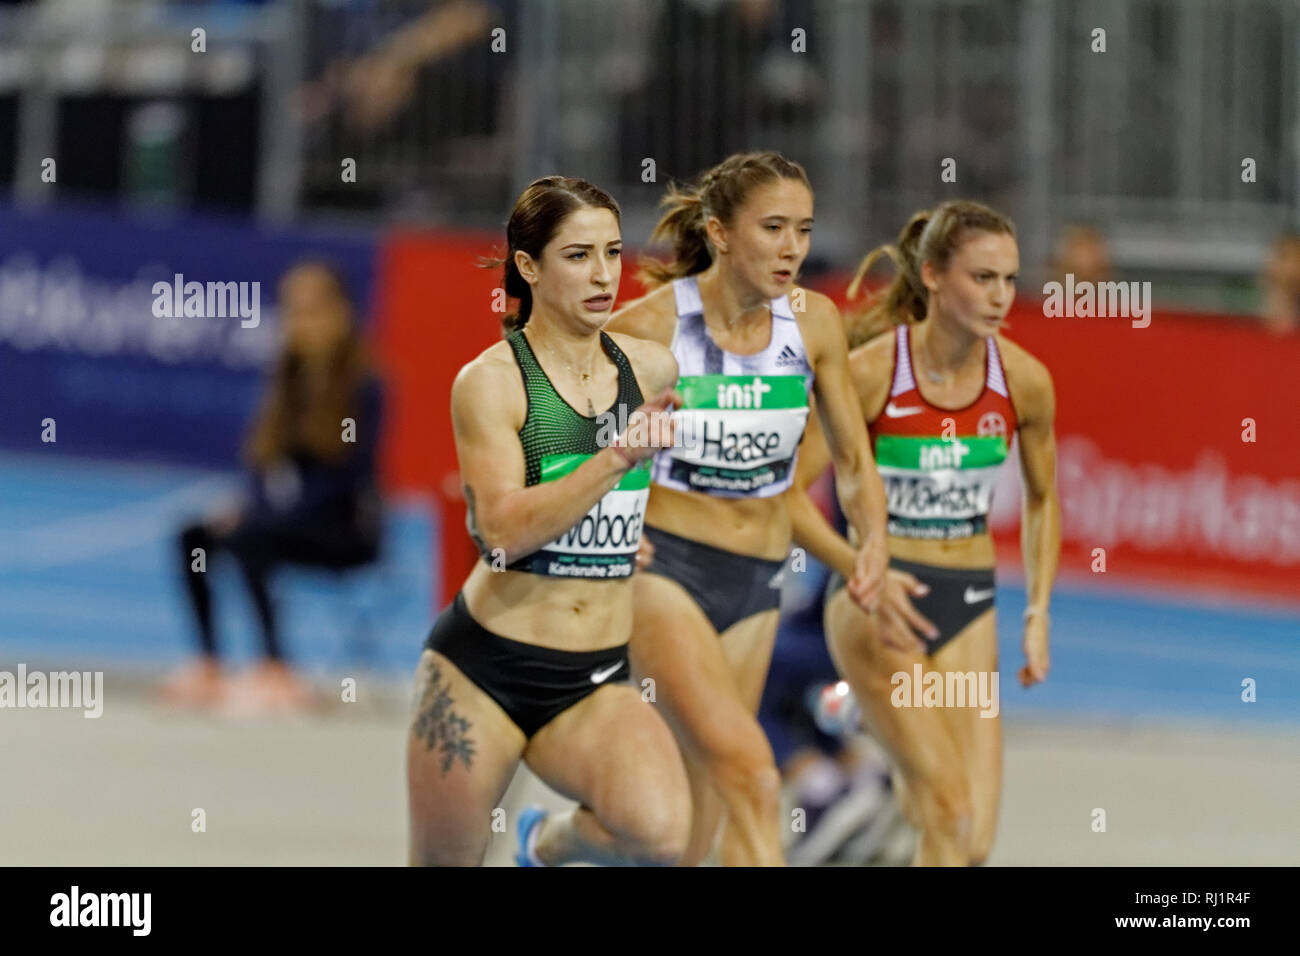 Ewa Swoboda, POL, at the IAAF indoor meeting Karlsruhe 2019 - Stock Image